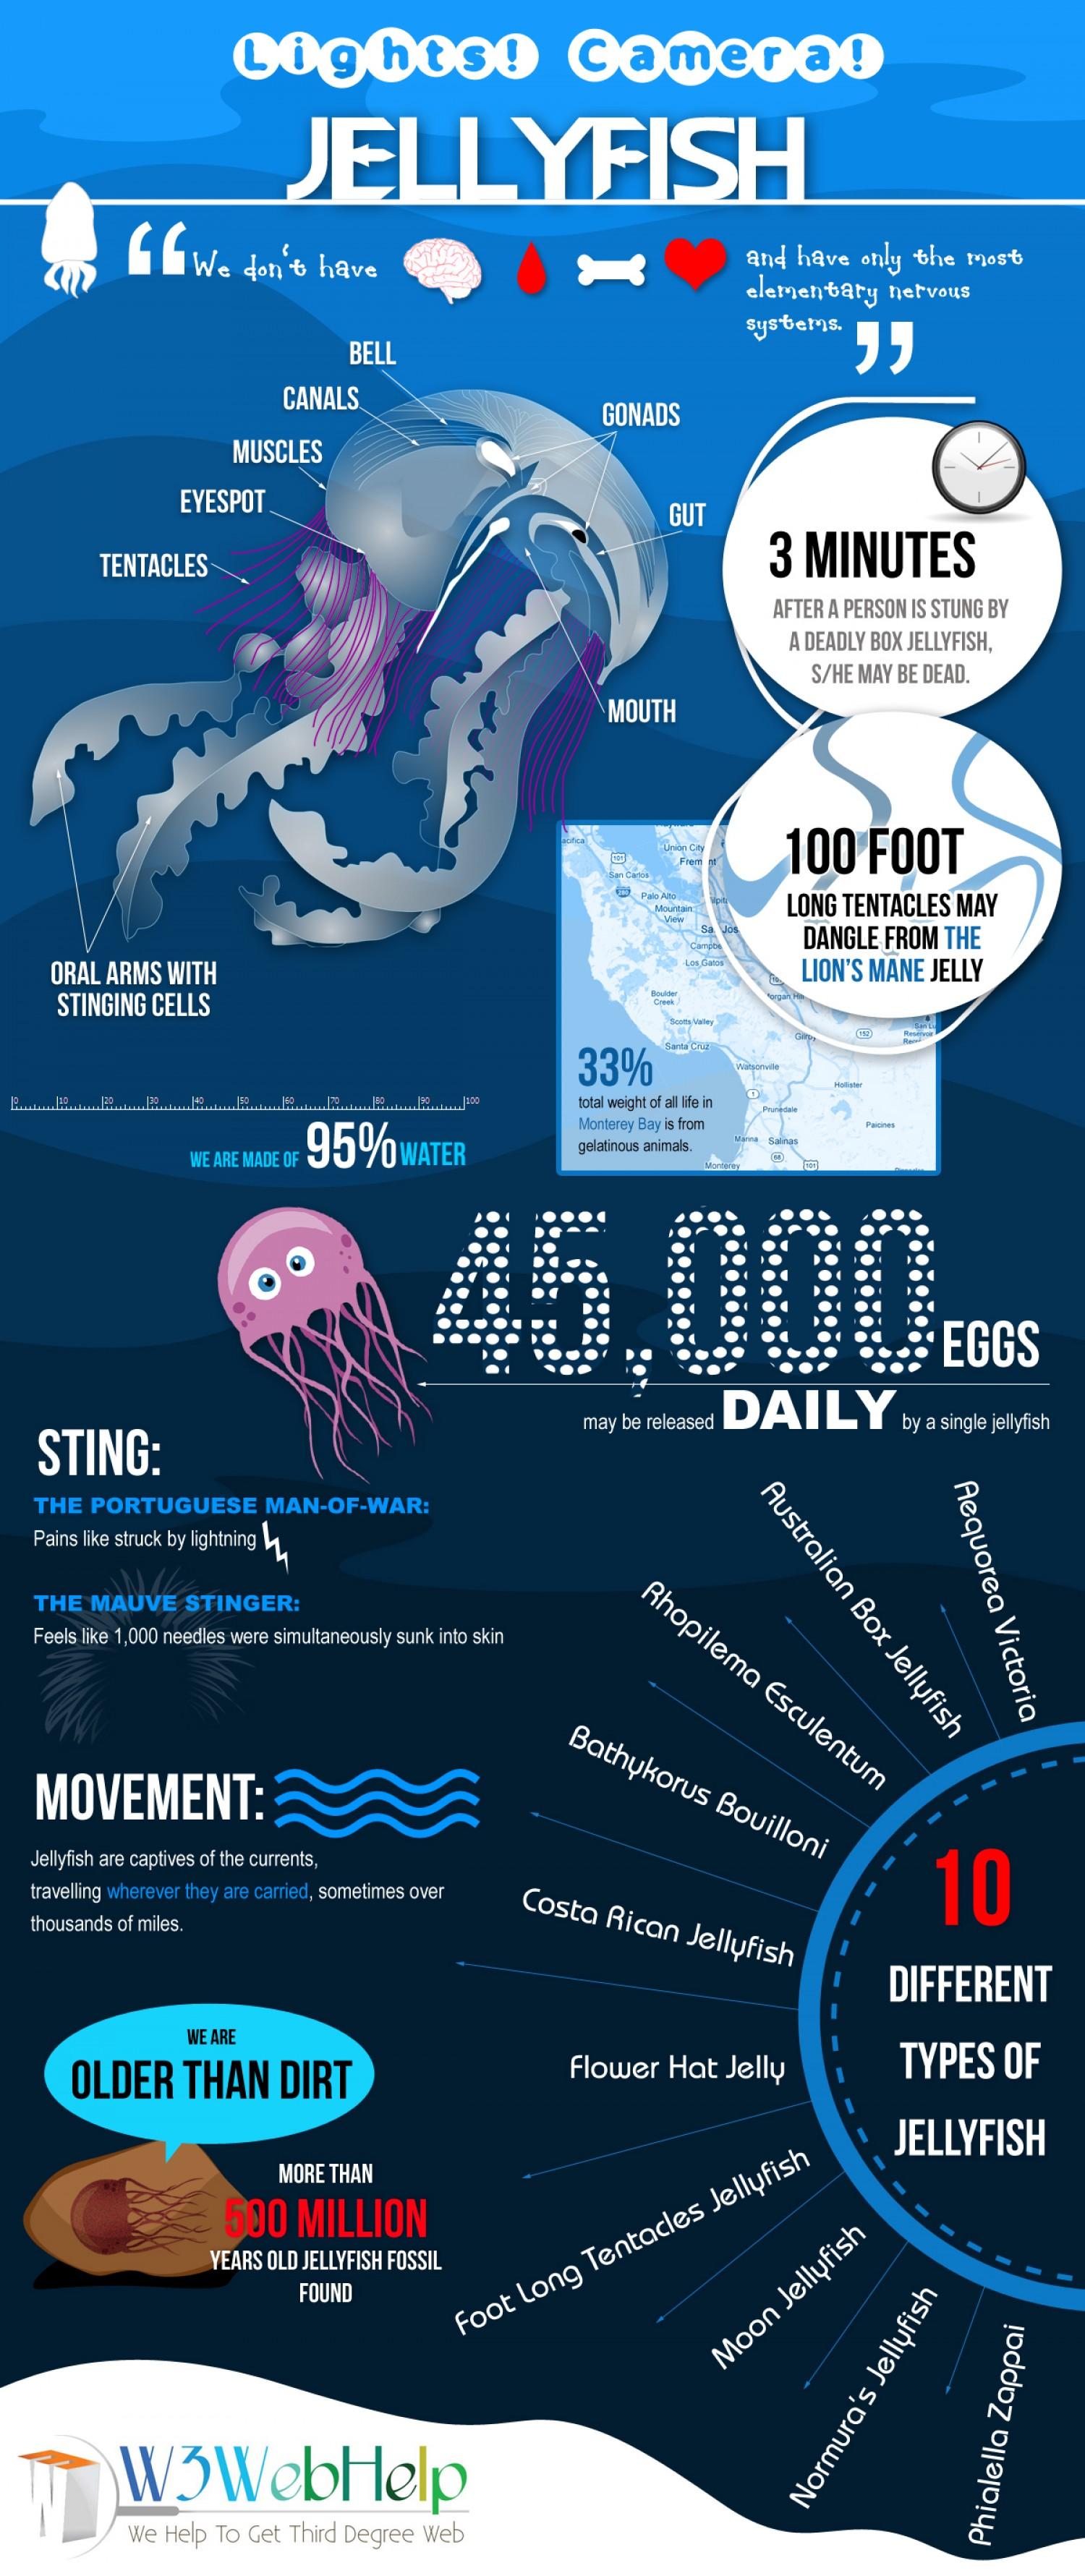 6. Jellyfish